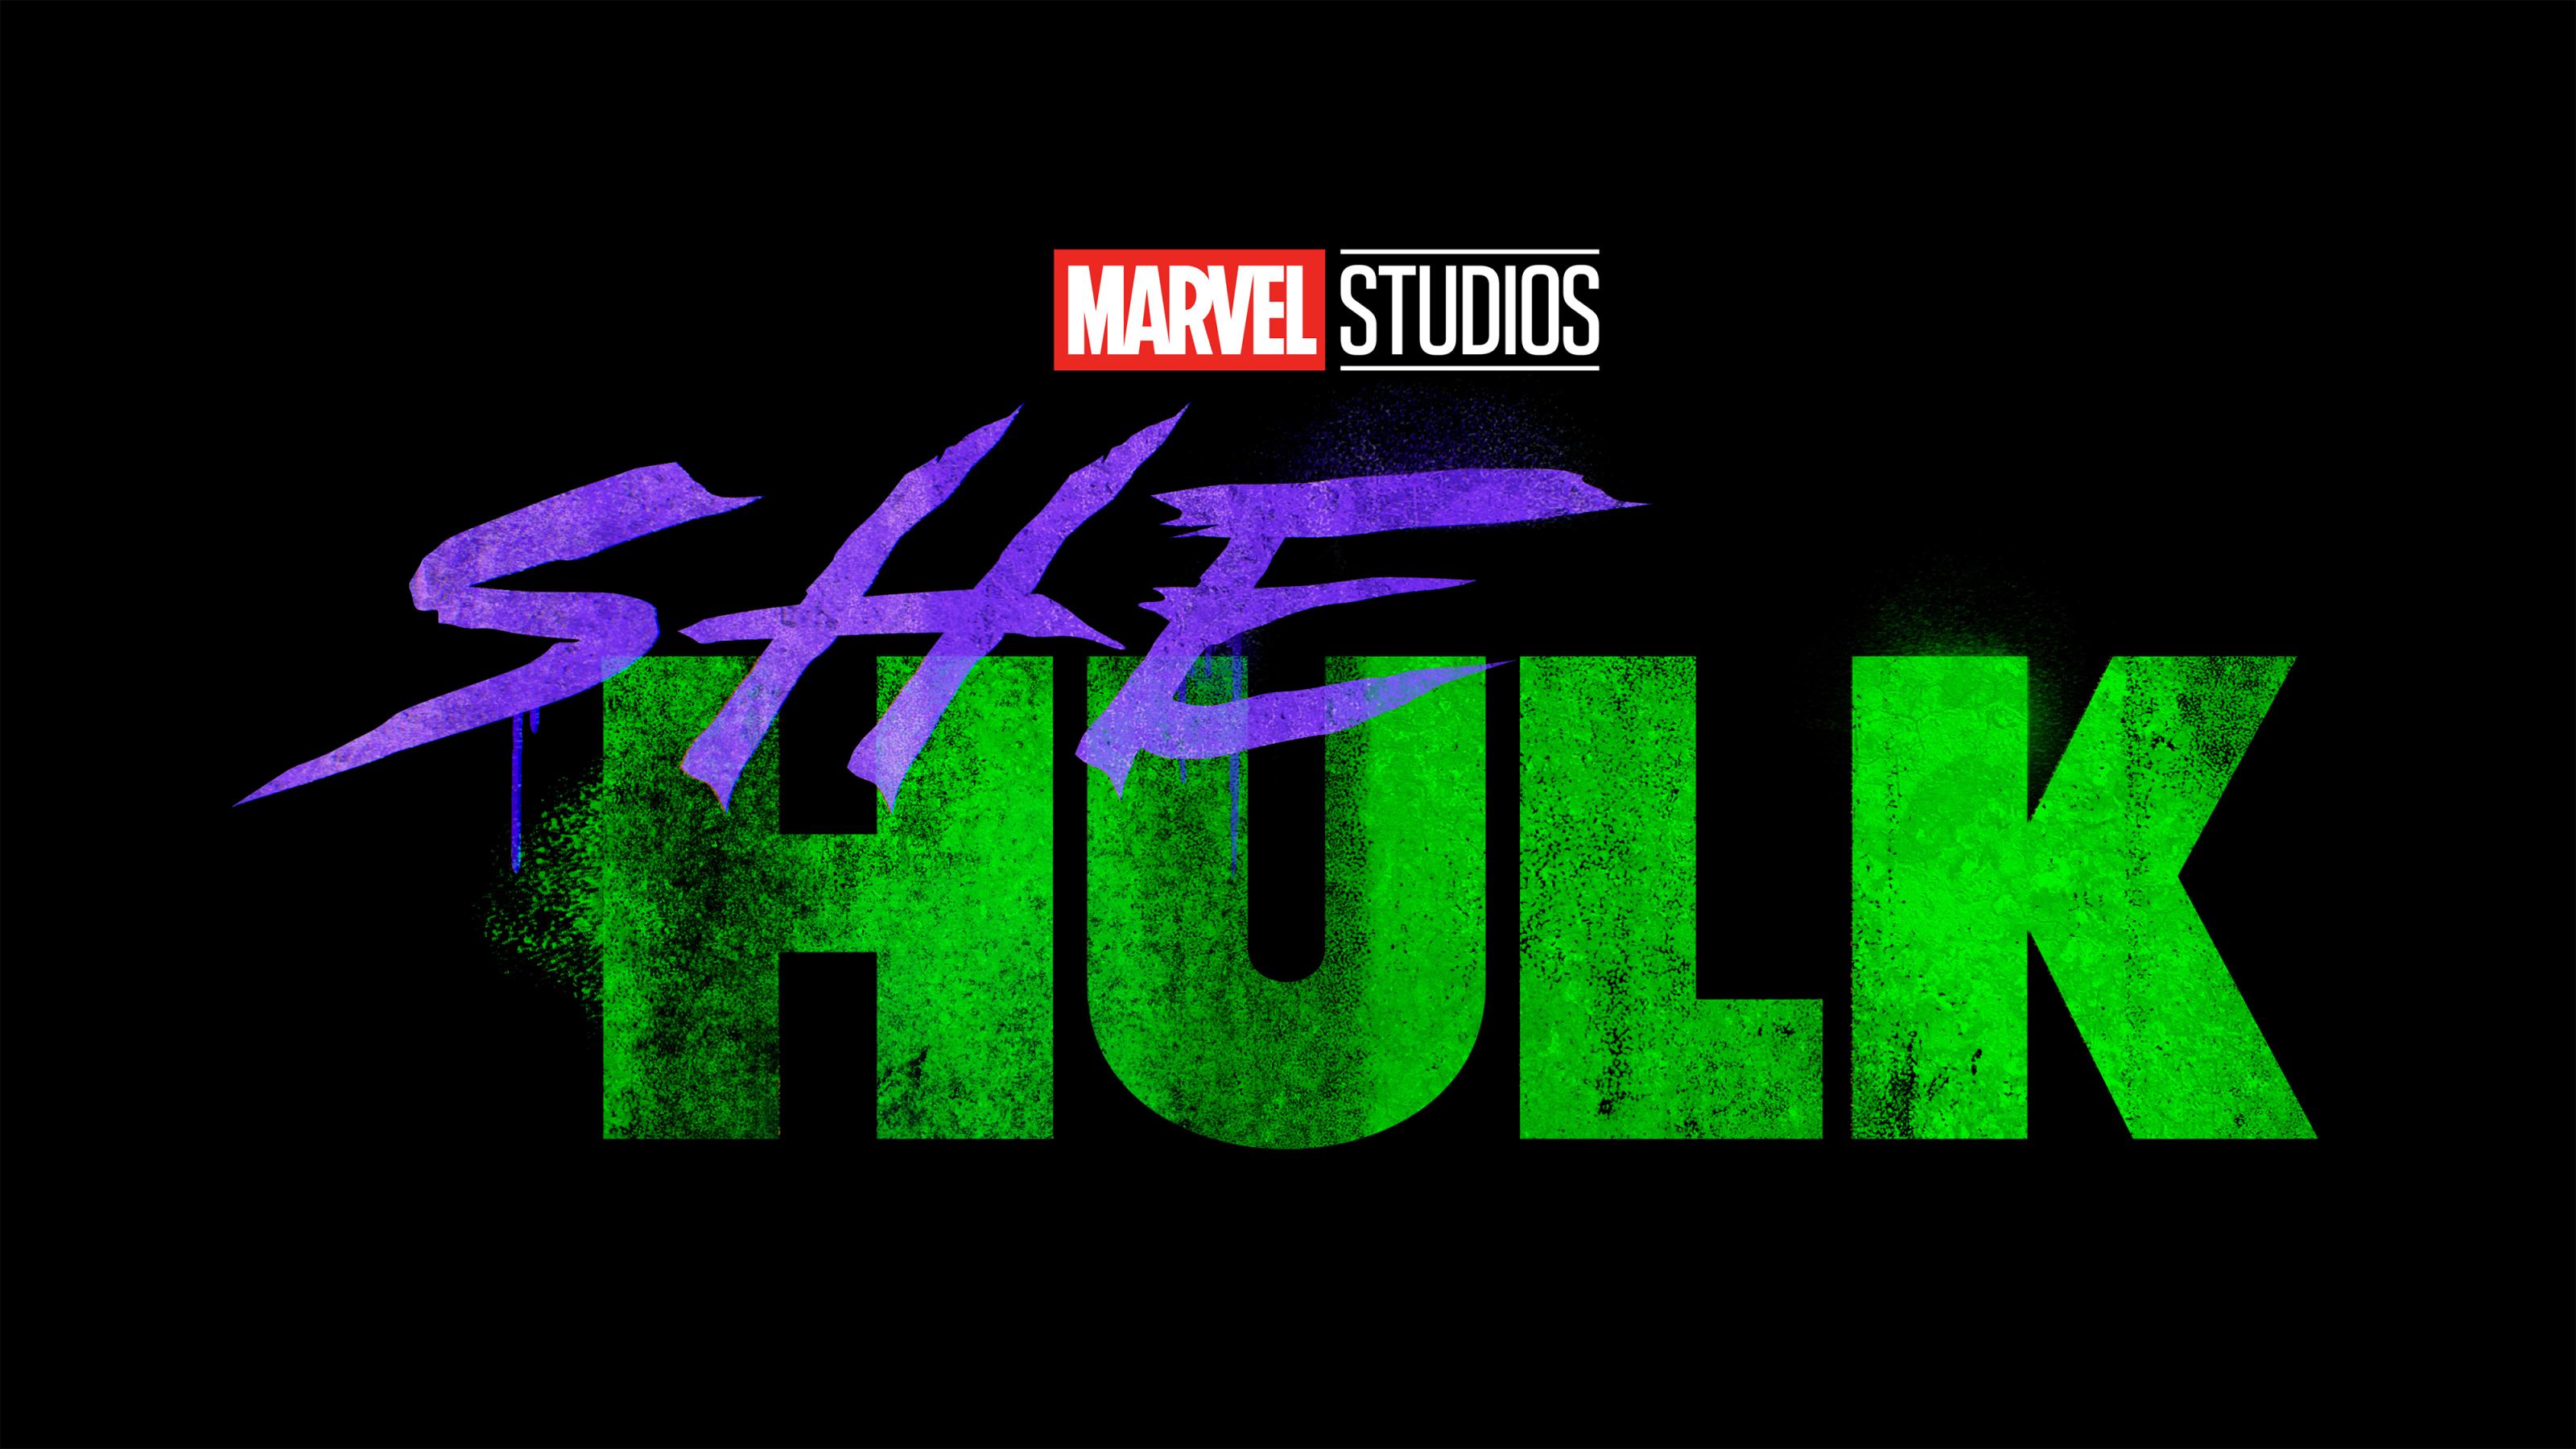 She-Hulk: The Disney Plus show will feature a comic-accurate, origin story